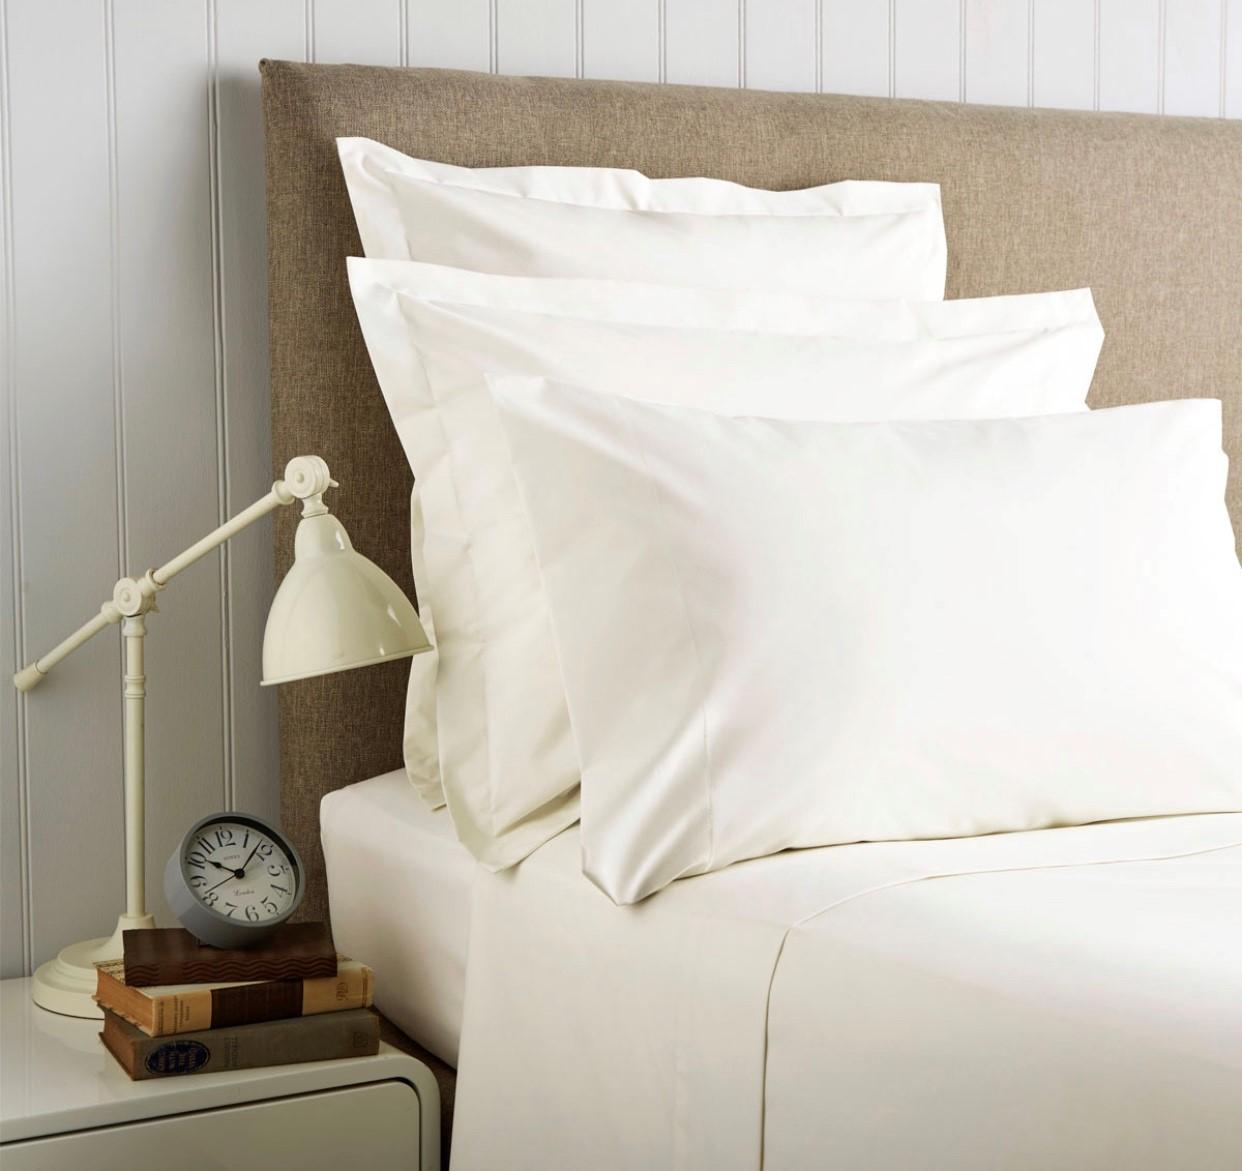 Christy '400 Thread Count Cotton Sateen' Flat Sheet Ivory